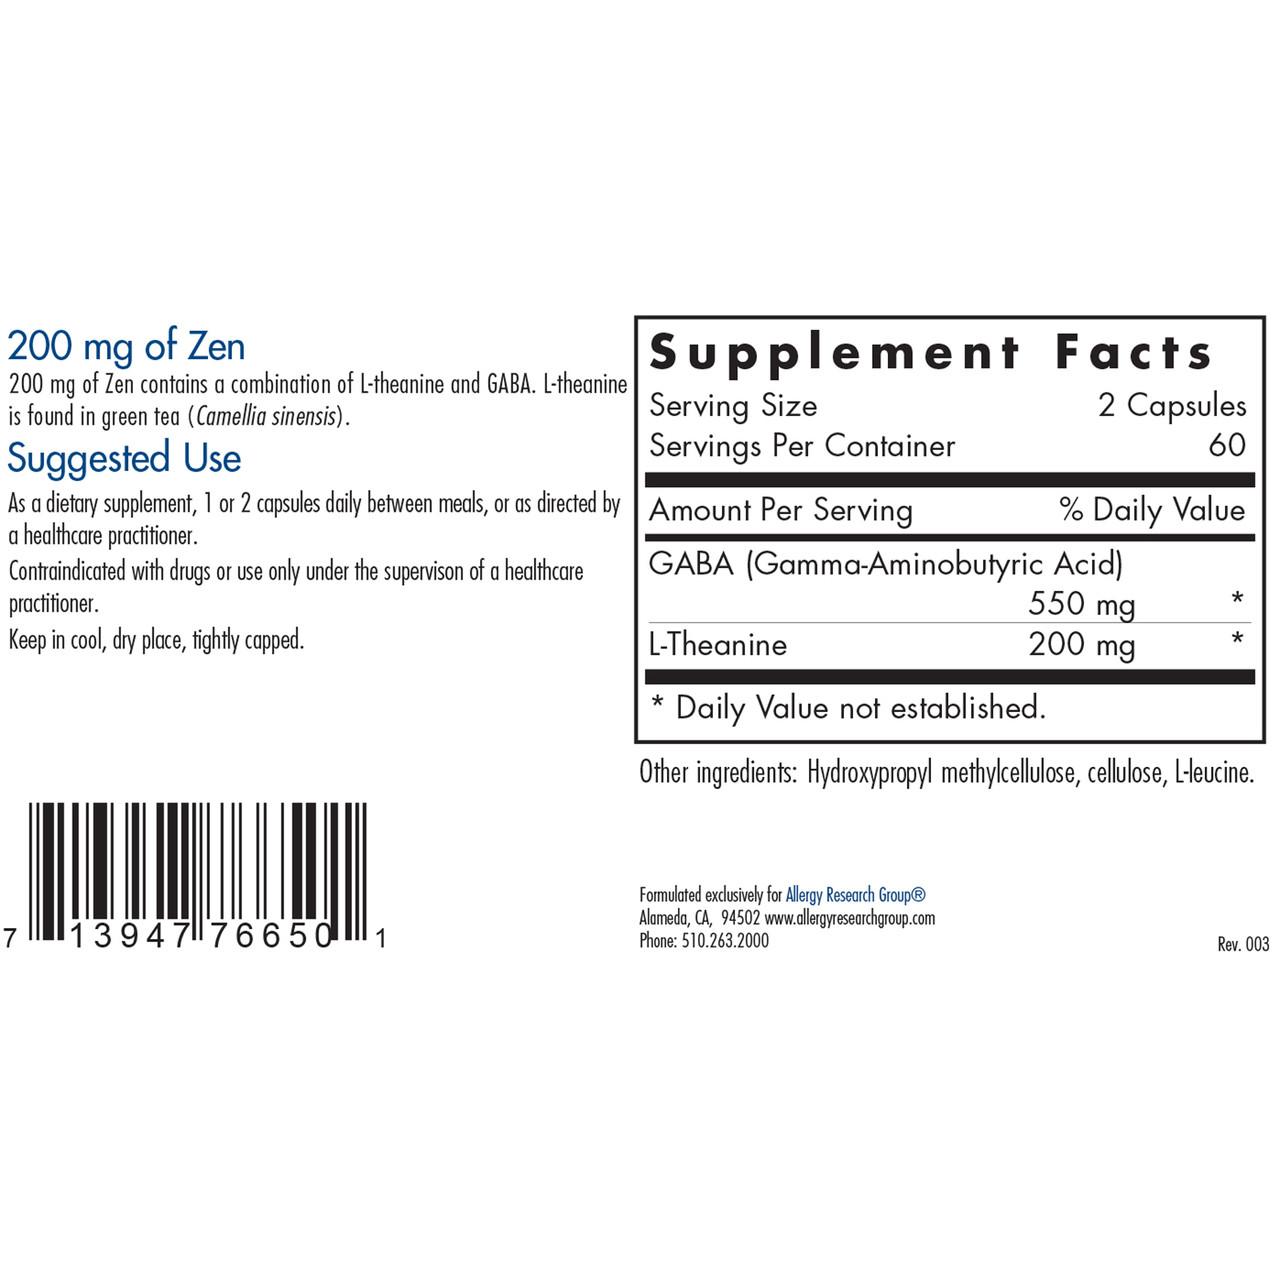 Allergy Research Group 200 mg of Zen 120 caps ingredients